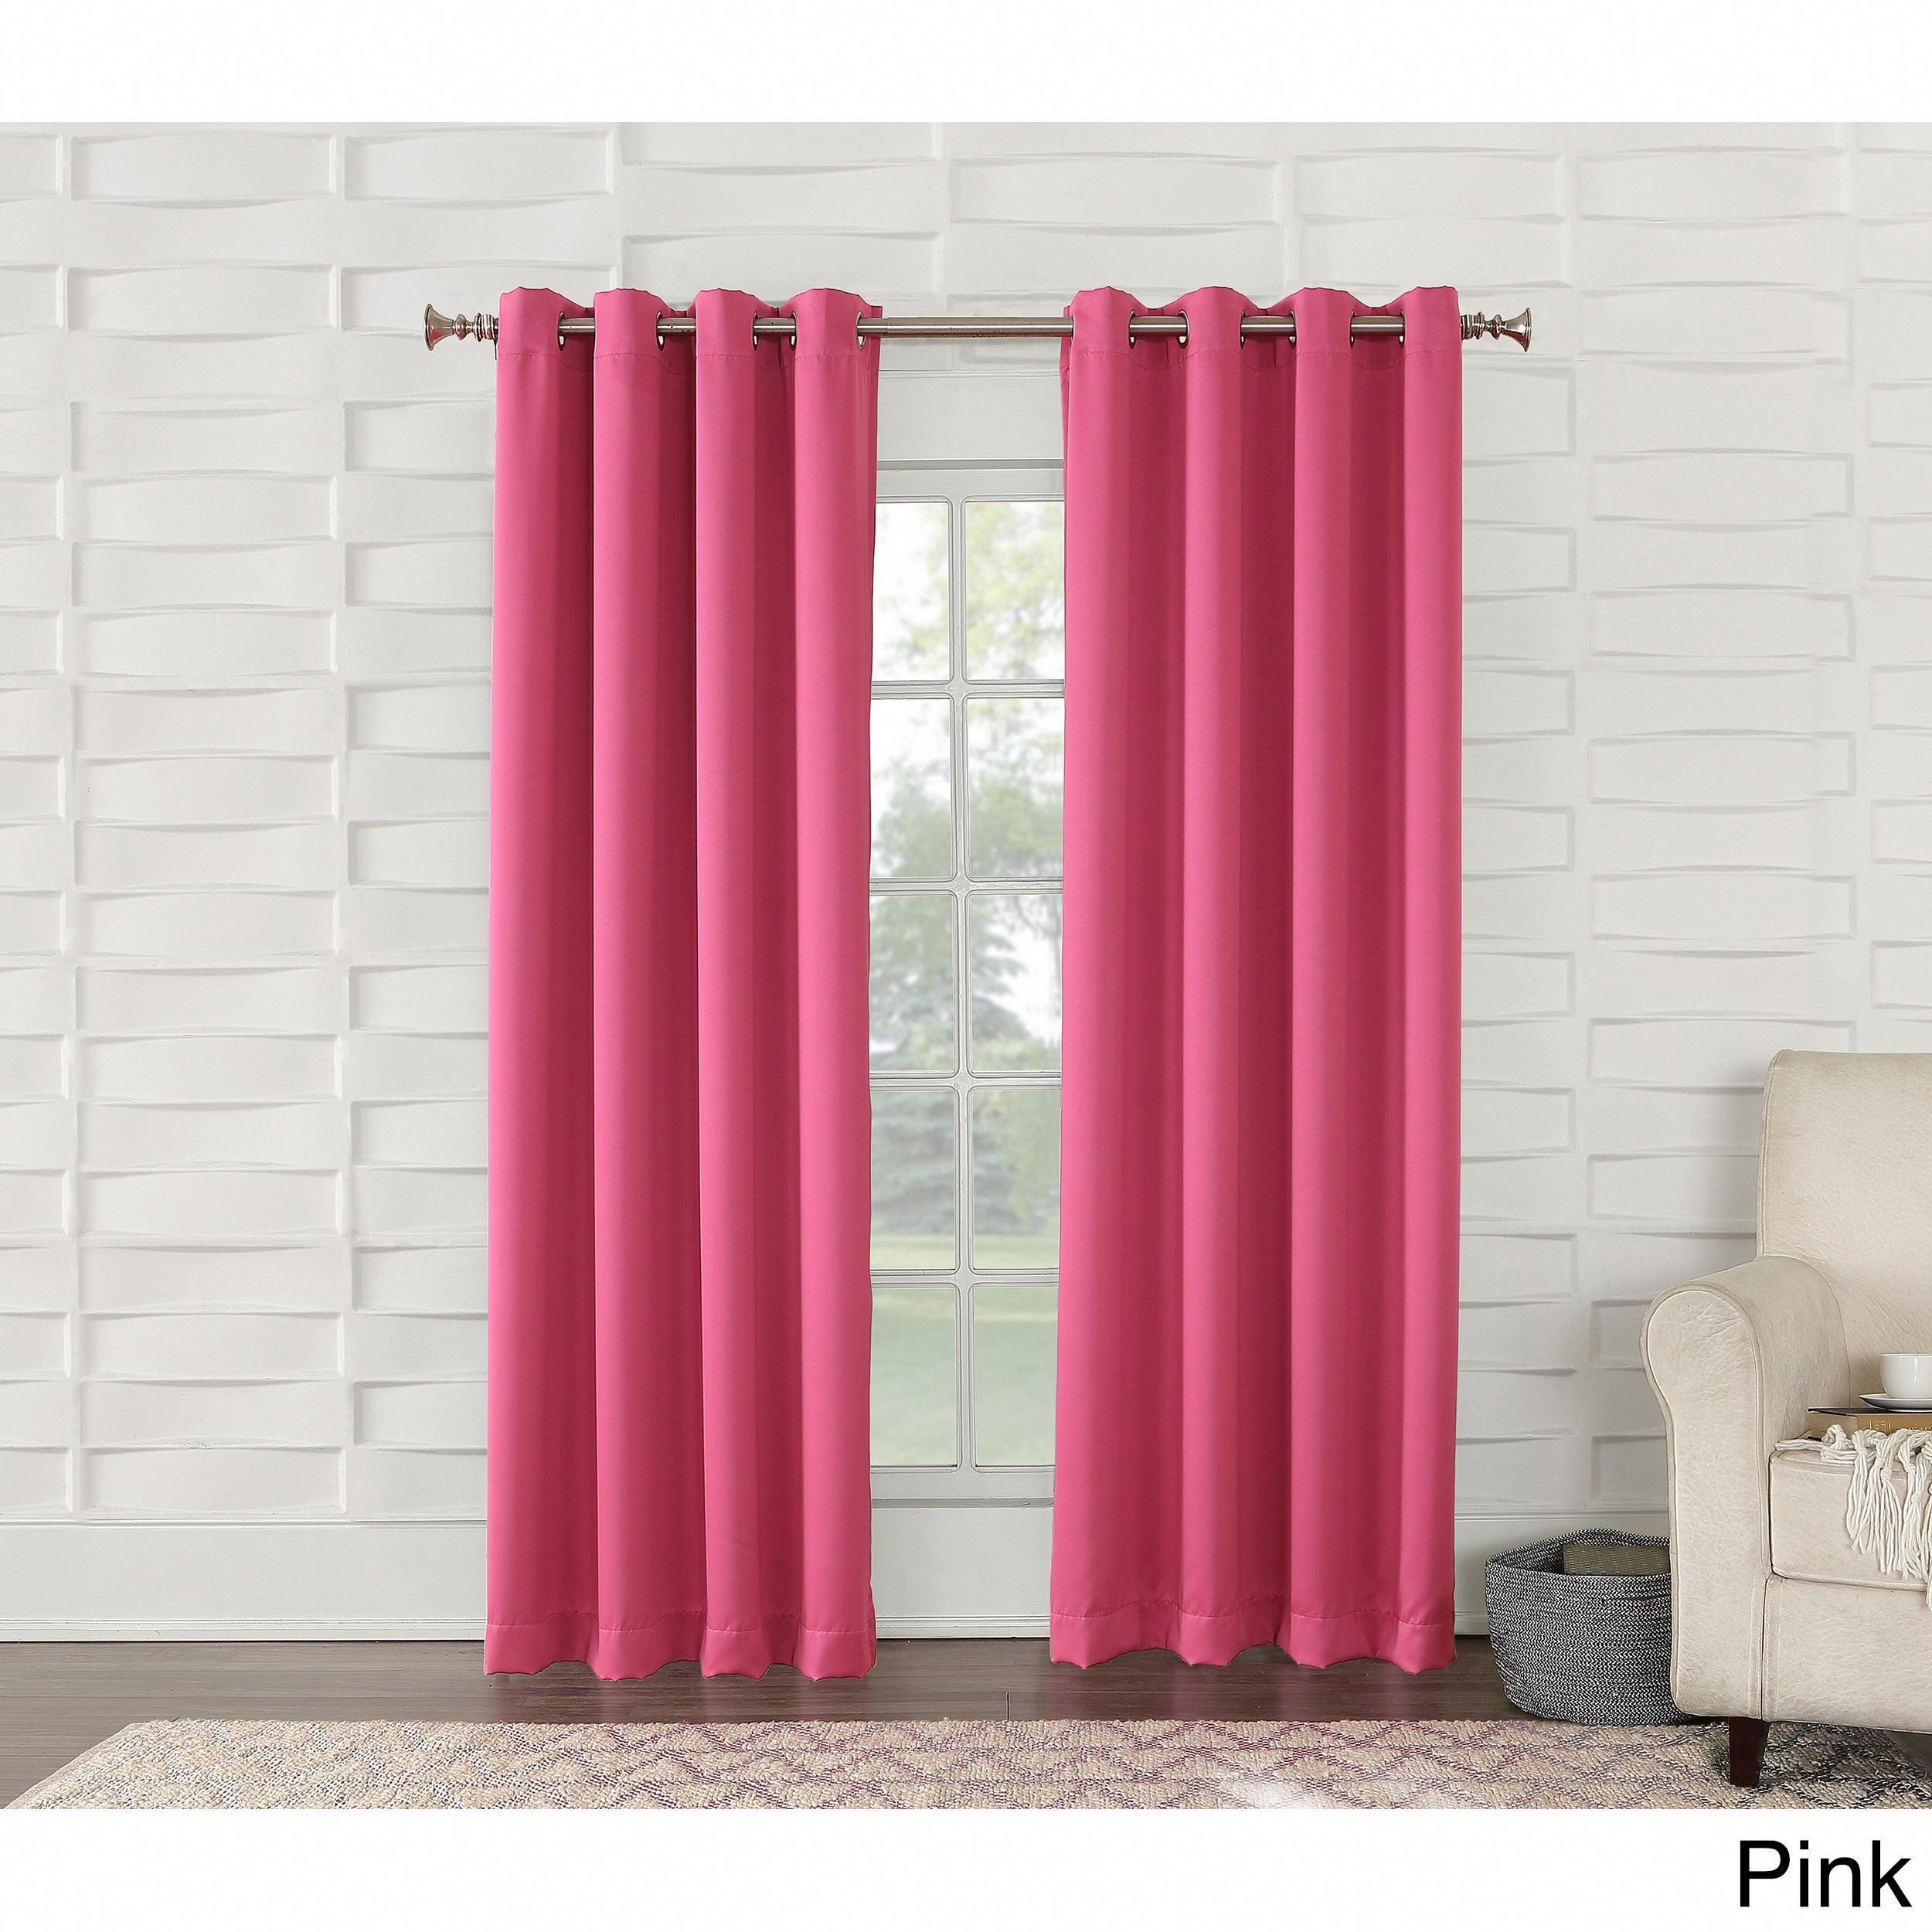 Laurel Creek Manistee Grommet Room Darkening Curtain Panel For Riley Kids Bedroom Blackout Grommet Curtain Panels (View 12 of 20)